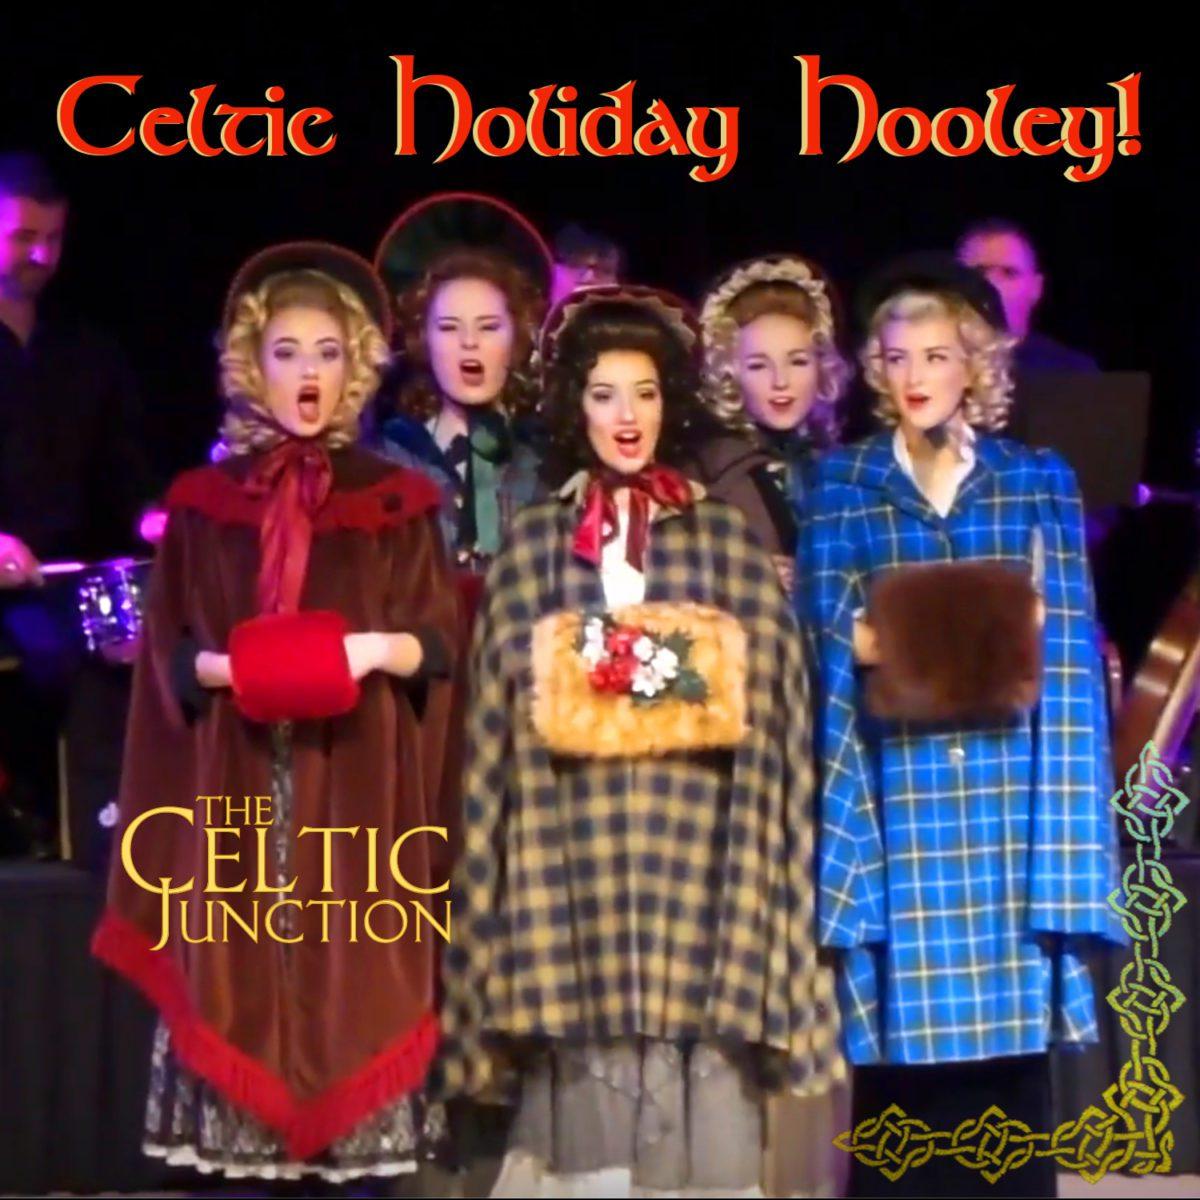 Celtic Holiday Hooley matinee